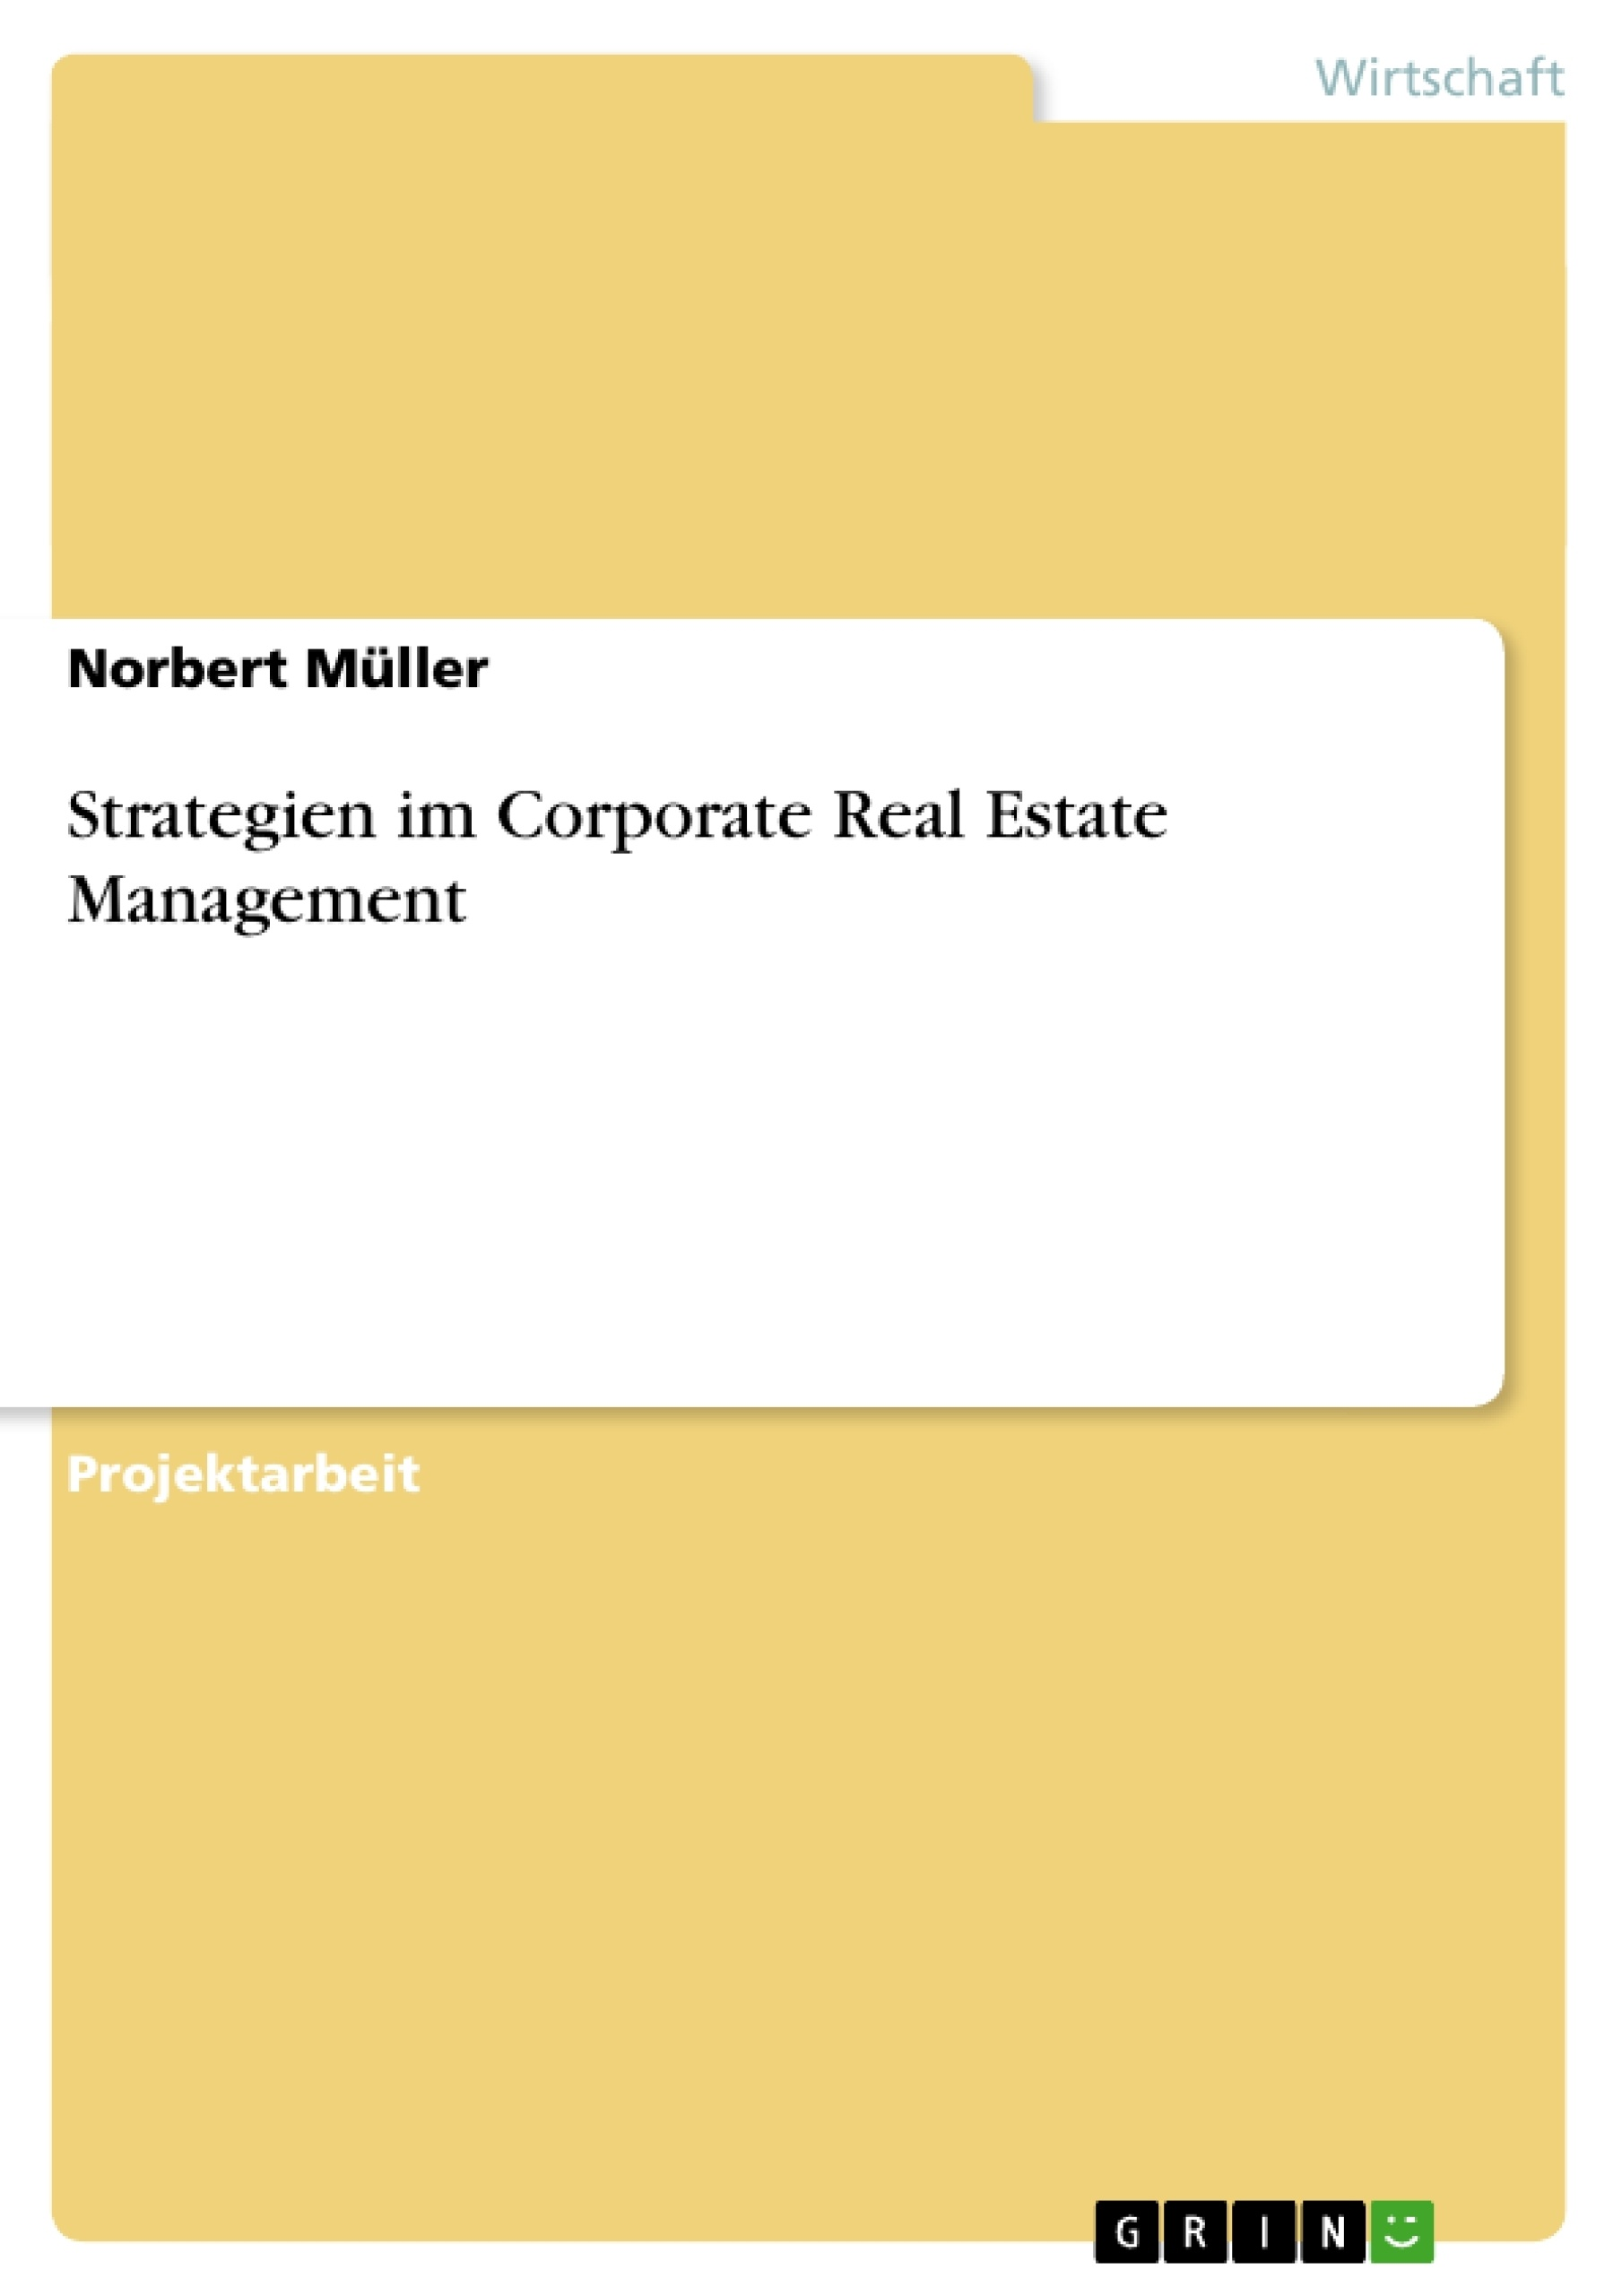 Titel: Strategien im Corporate Real Estate Management